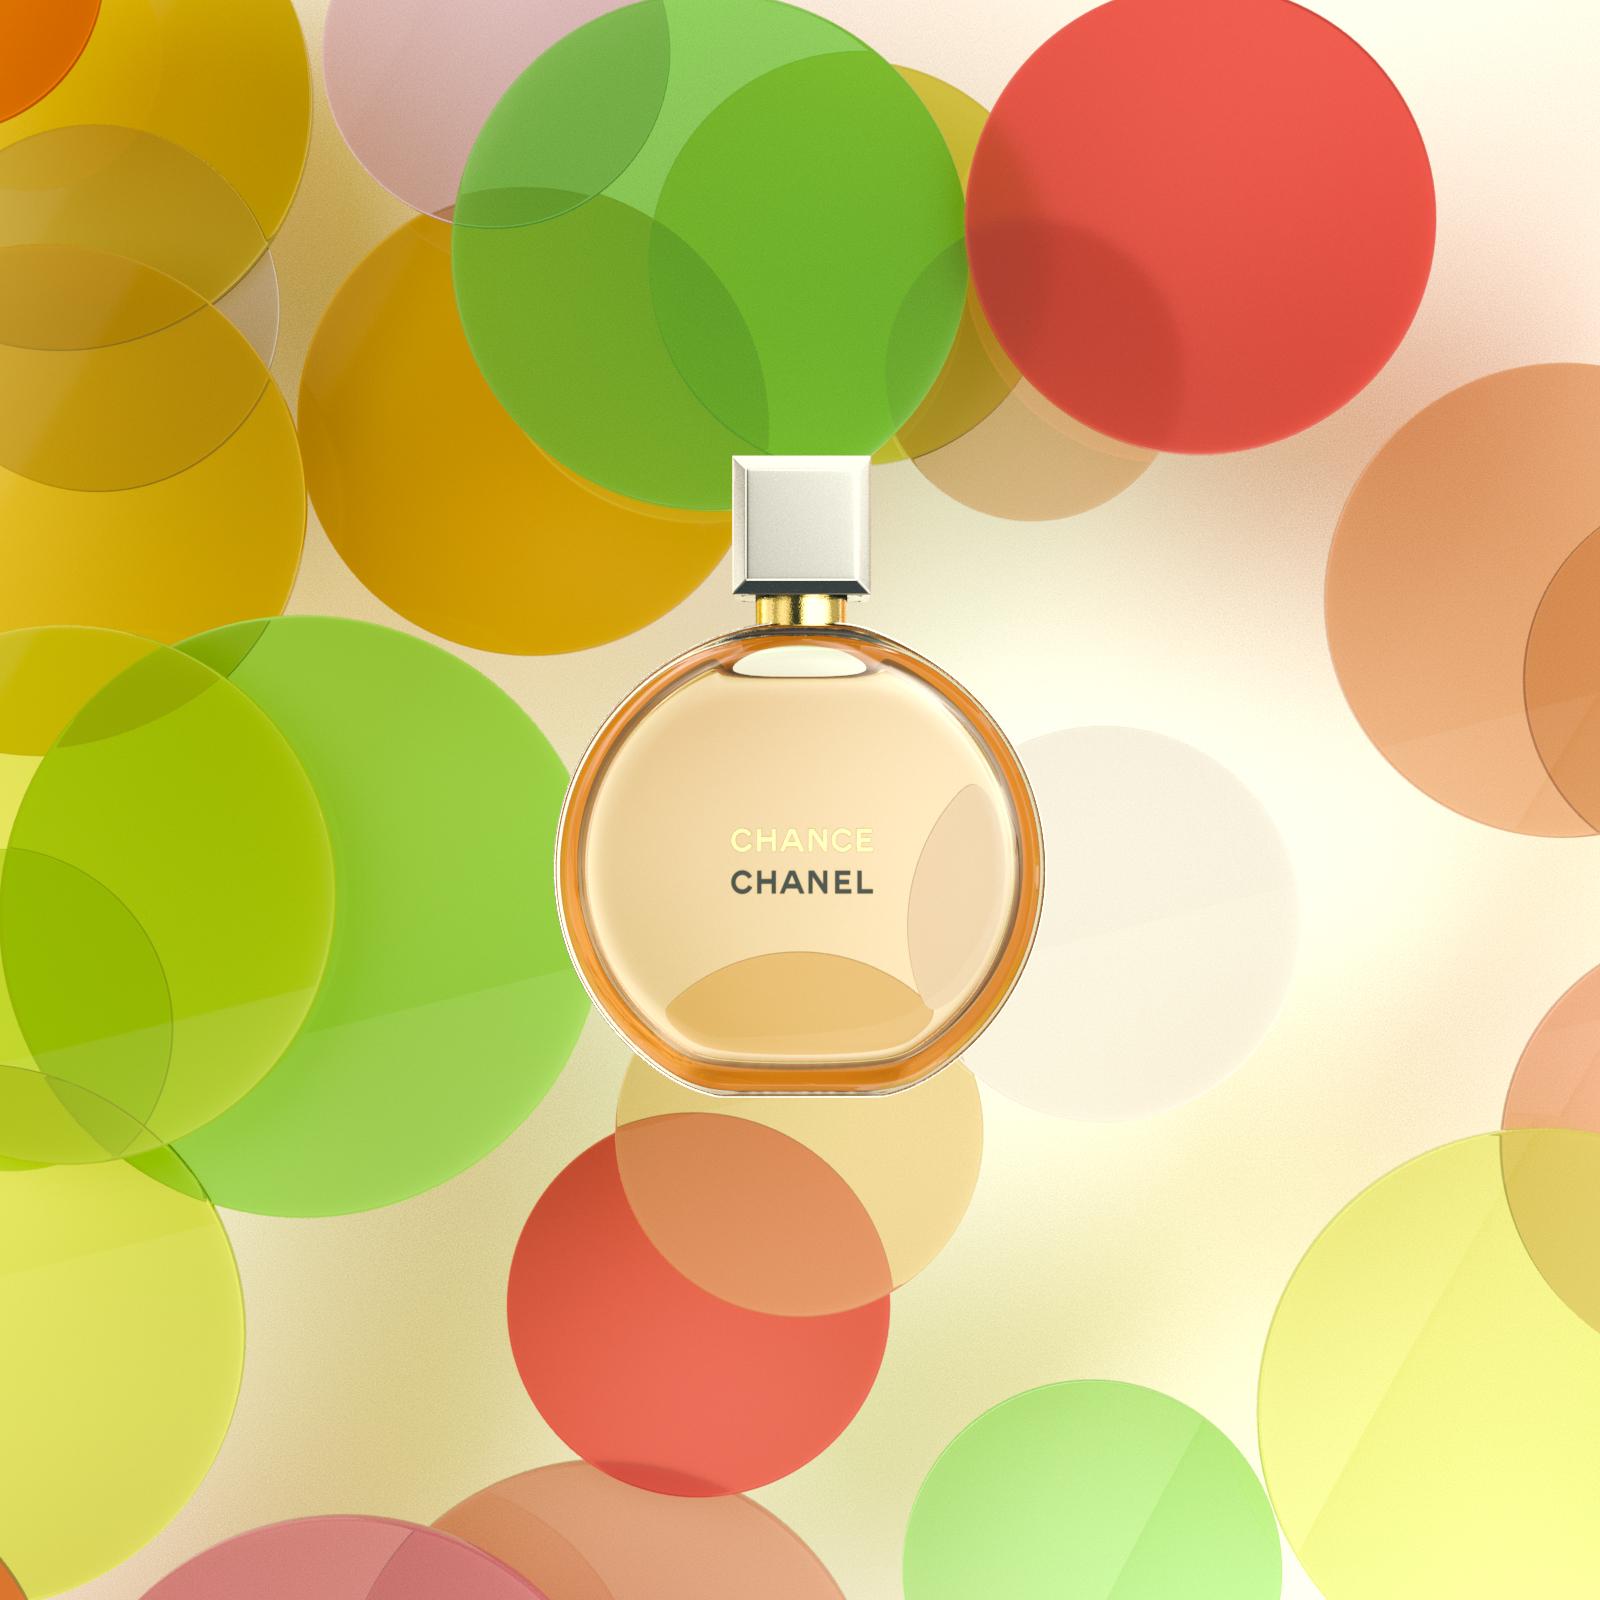 Chanel_Chance.jpg